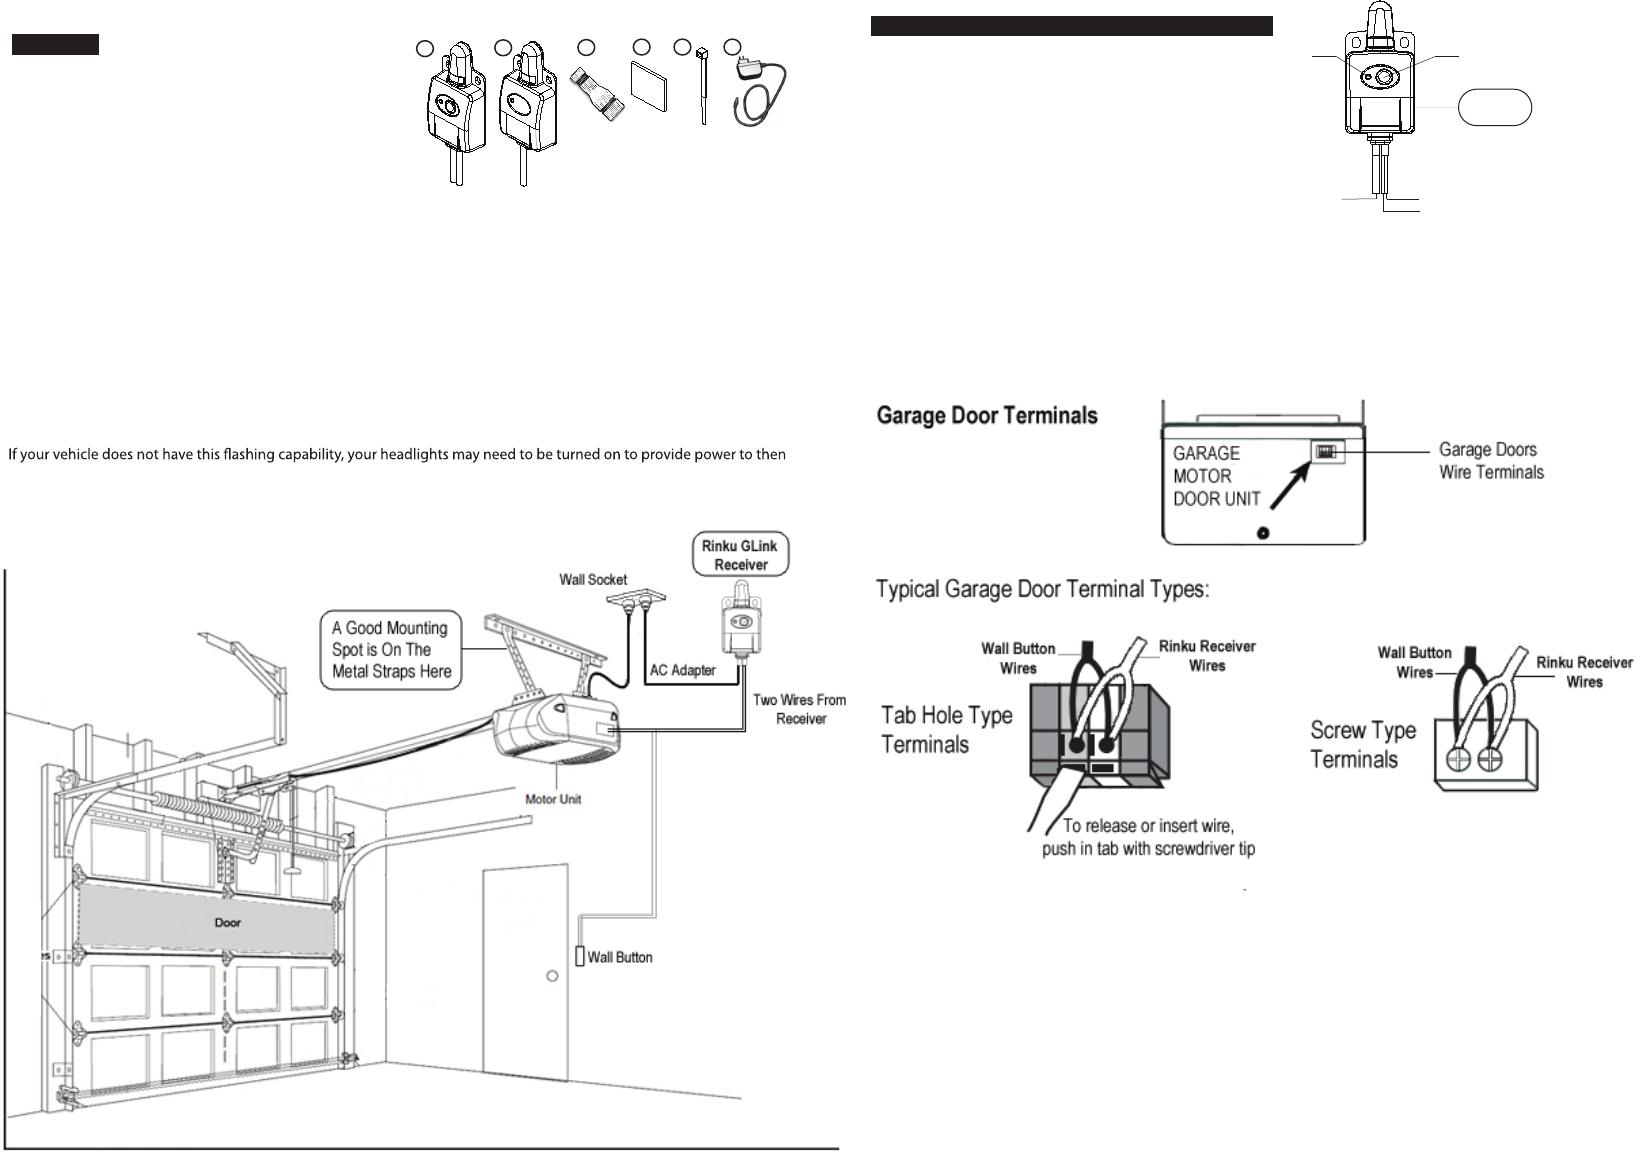 G Light Technology Rhggokit Gate Opener With Car Headlight Flashing User Manual Rh Ggo Kit Front V090913 F Pt03